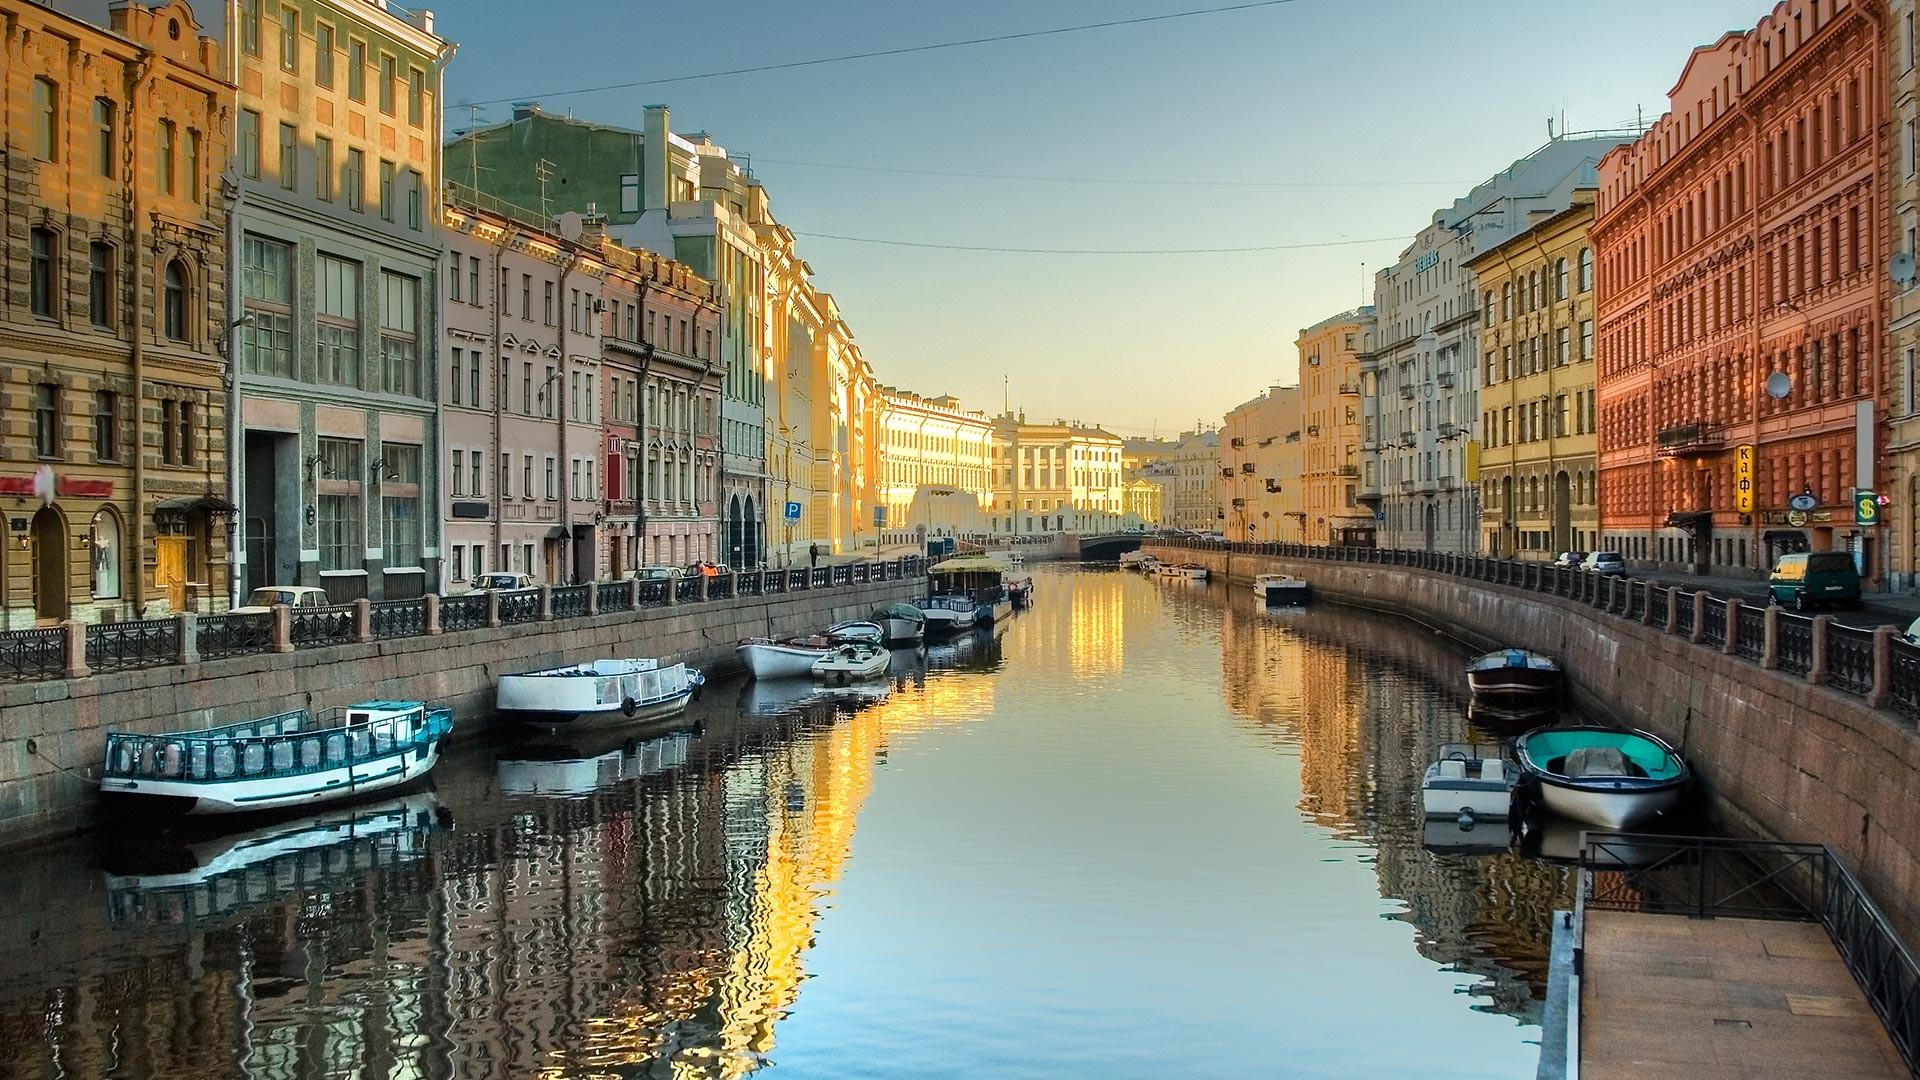 Moyka rivier in Sint-Petersburg